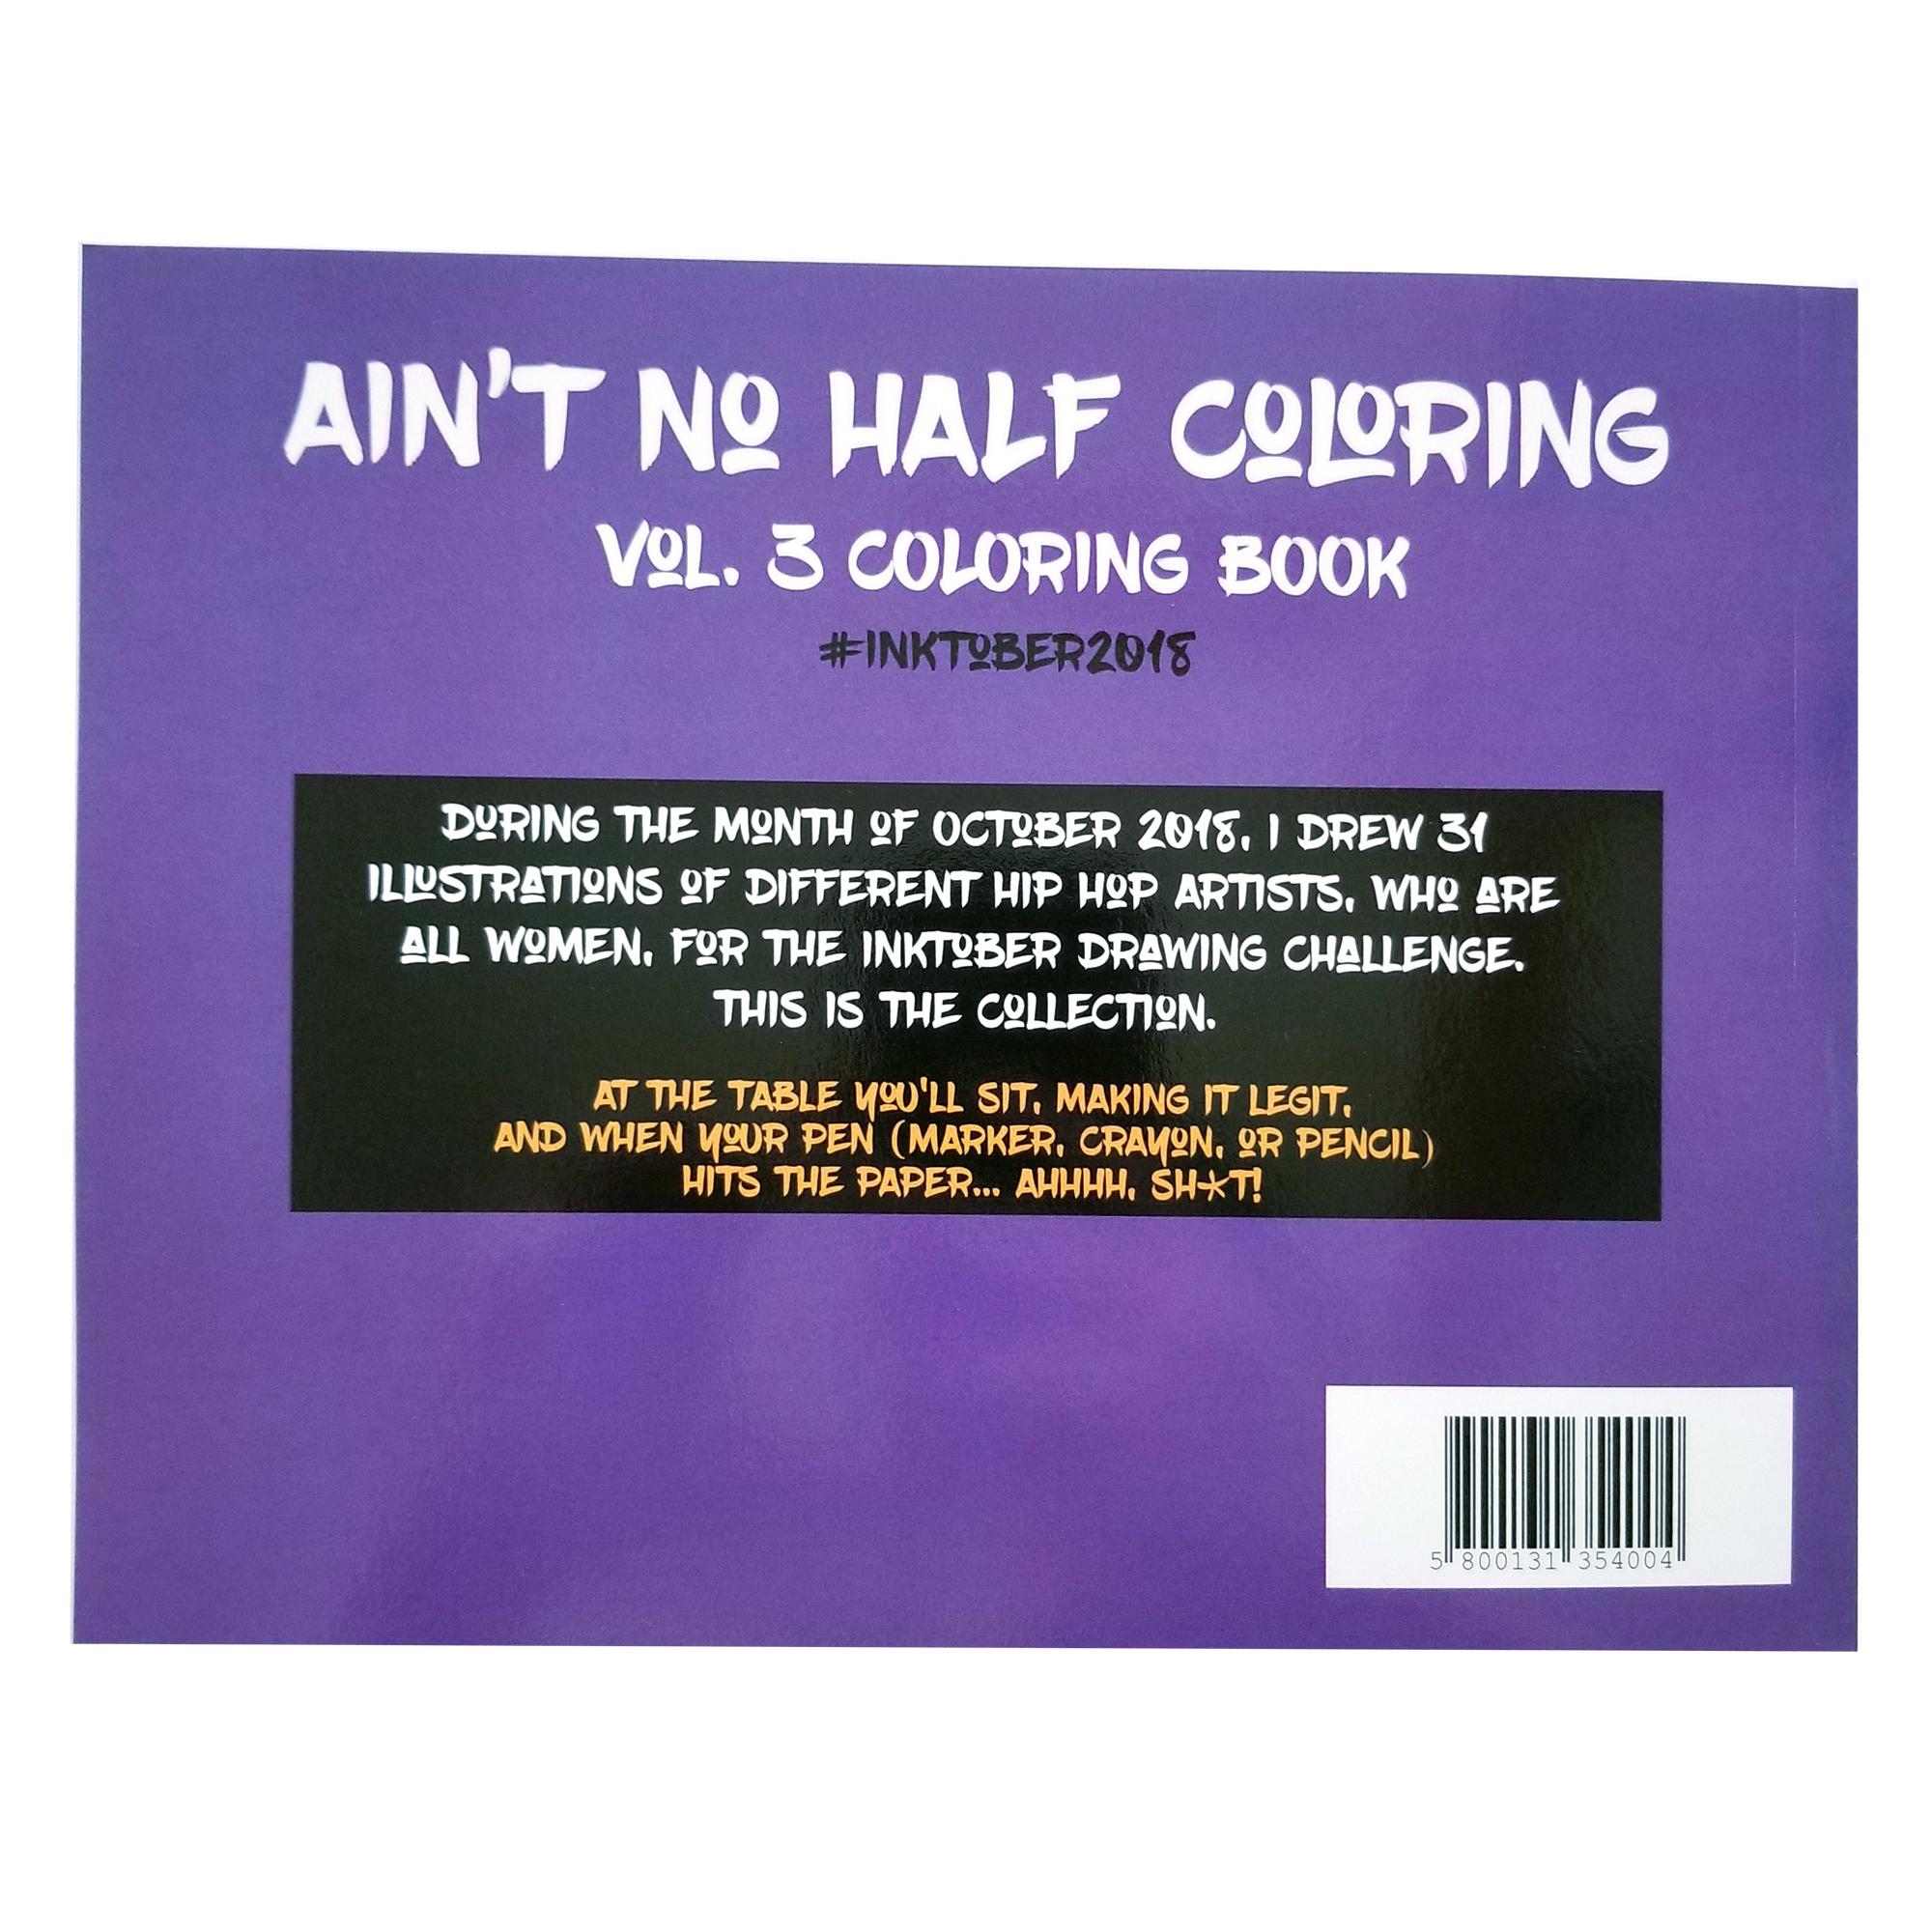 Ain't No Half Coloring (vol. 3)